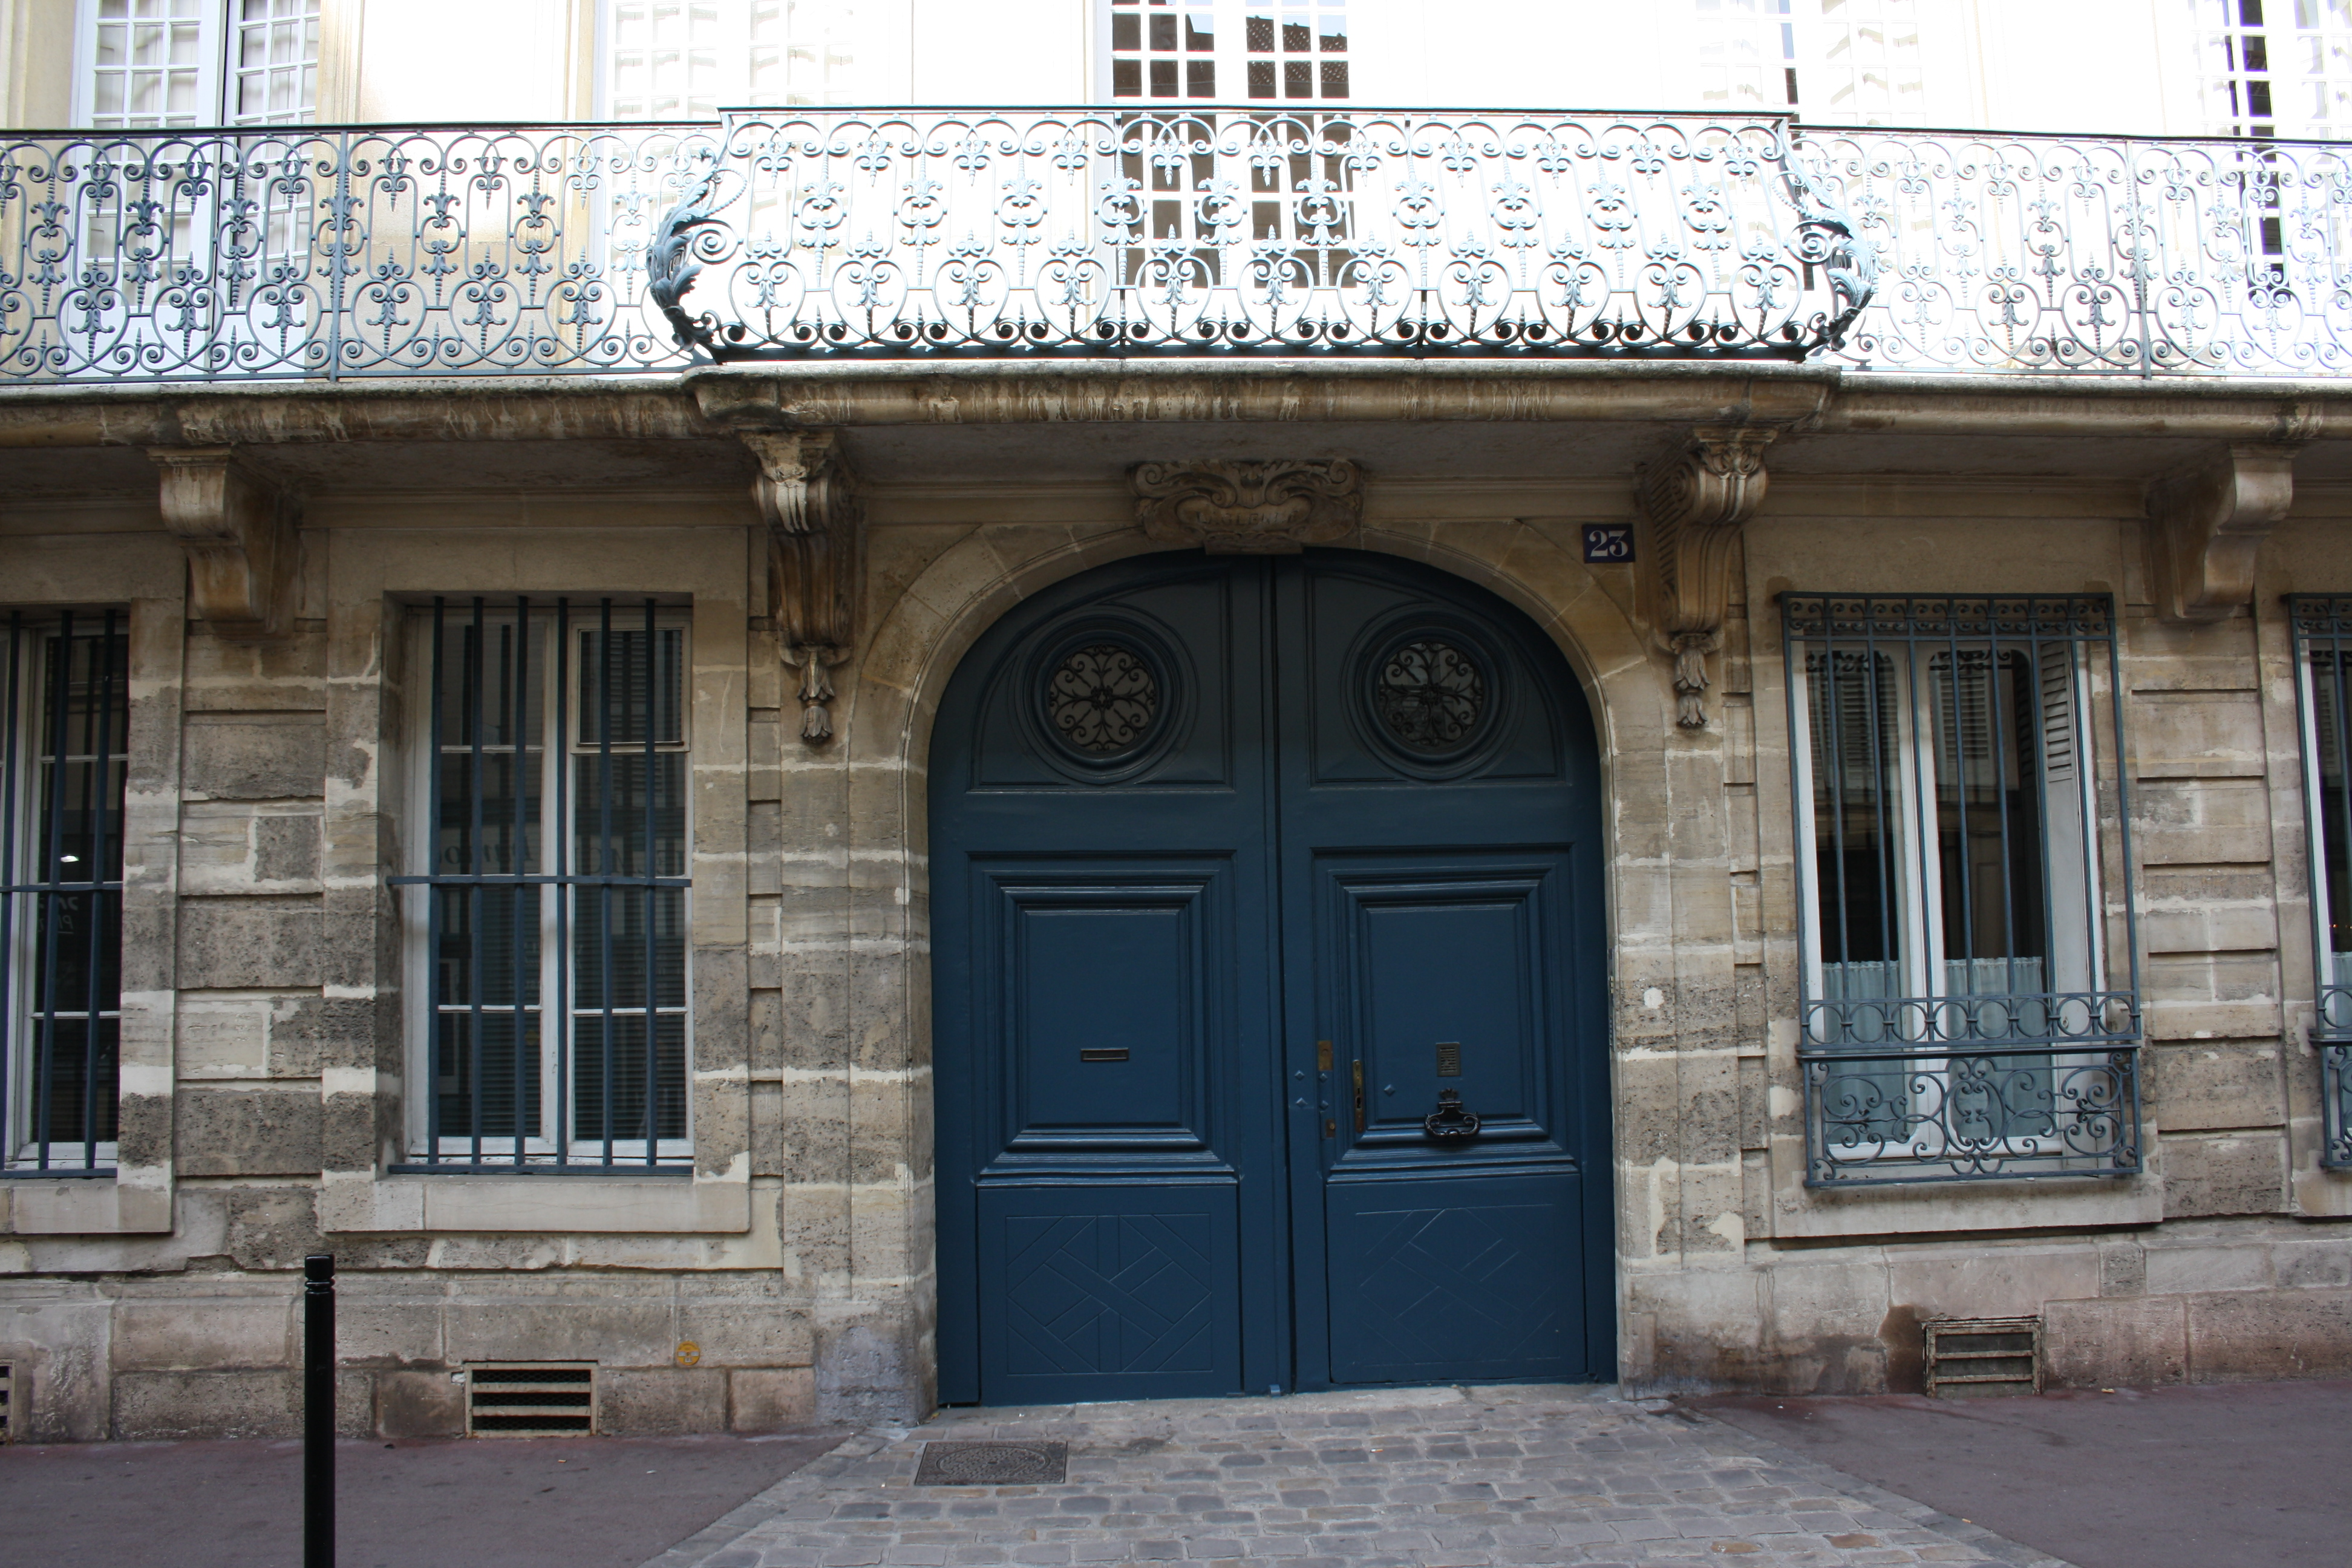 Home St Germain En Laye file:saint-germain-en-laye hôtel de madame de maintenon 2011